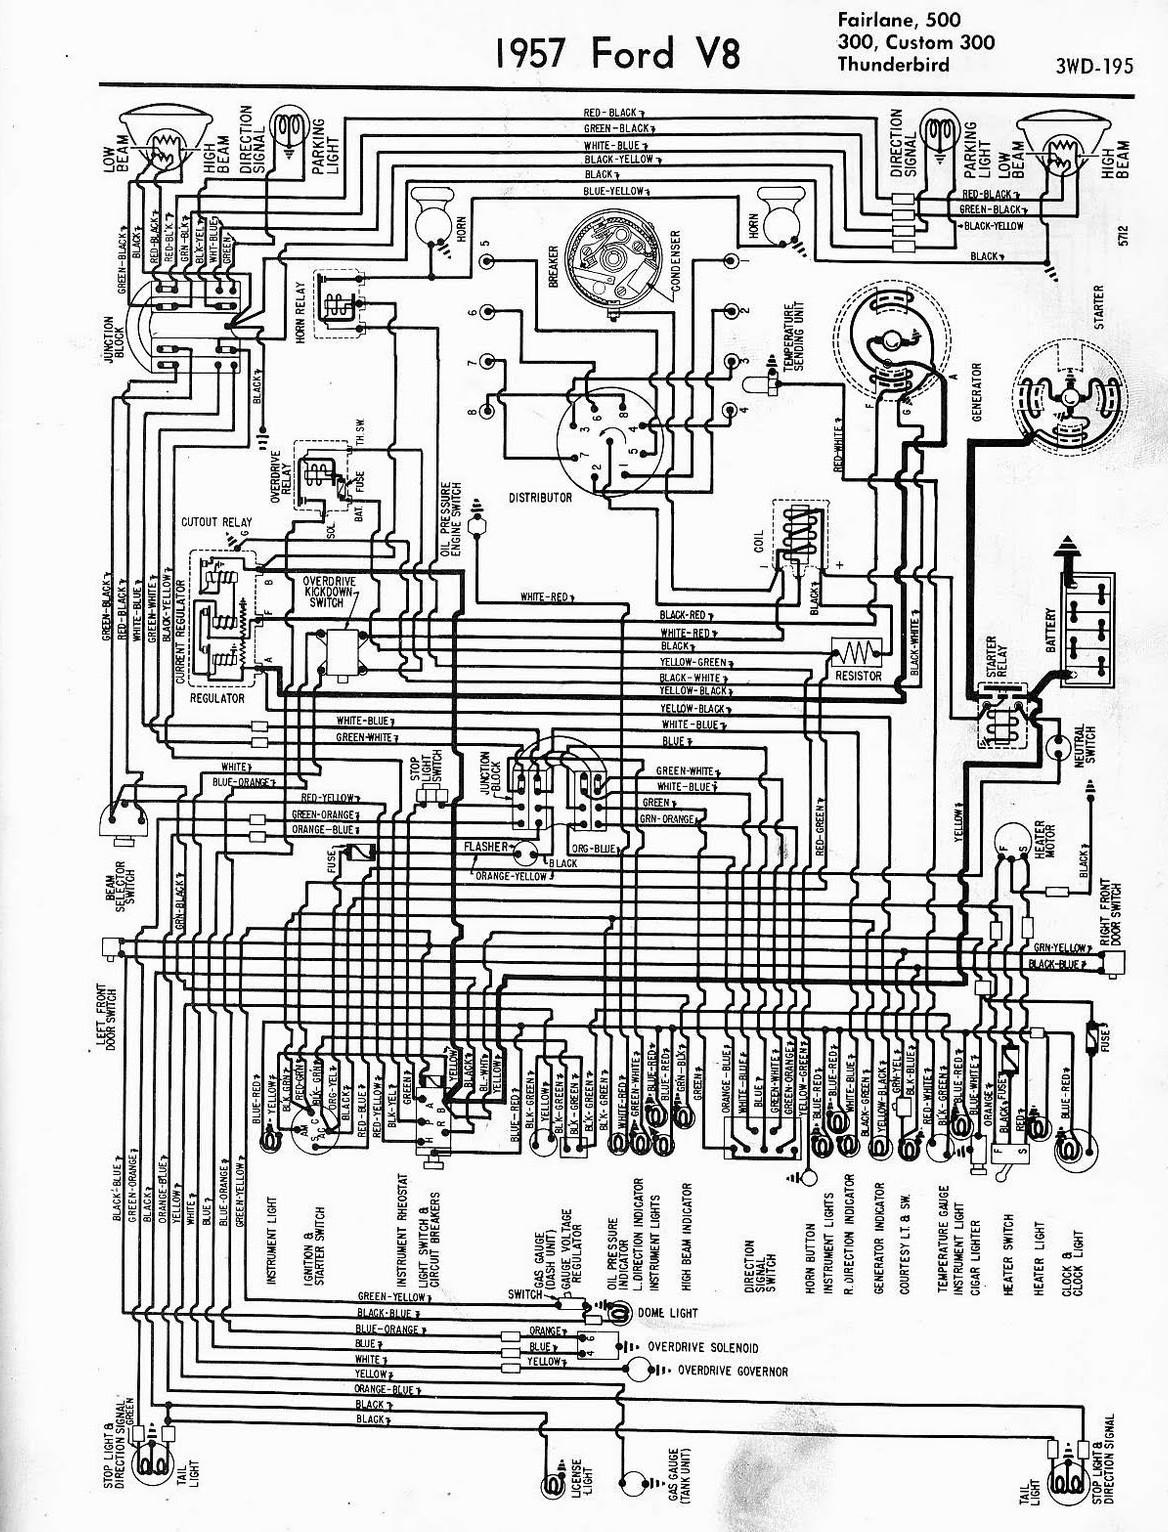 medium resolution of wiring diagrams of 1960 ford v8 thunderbird today wiring diagram1962 thunderbird fuse diagram wiring diagram schema